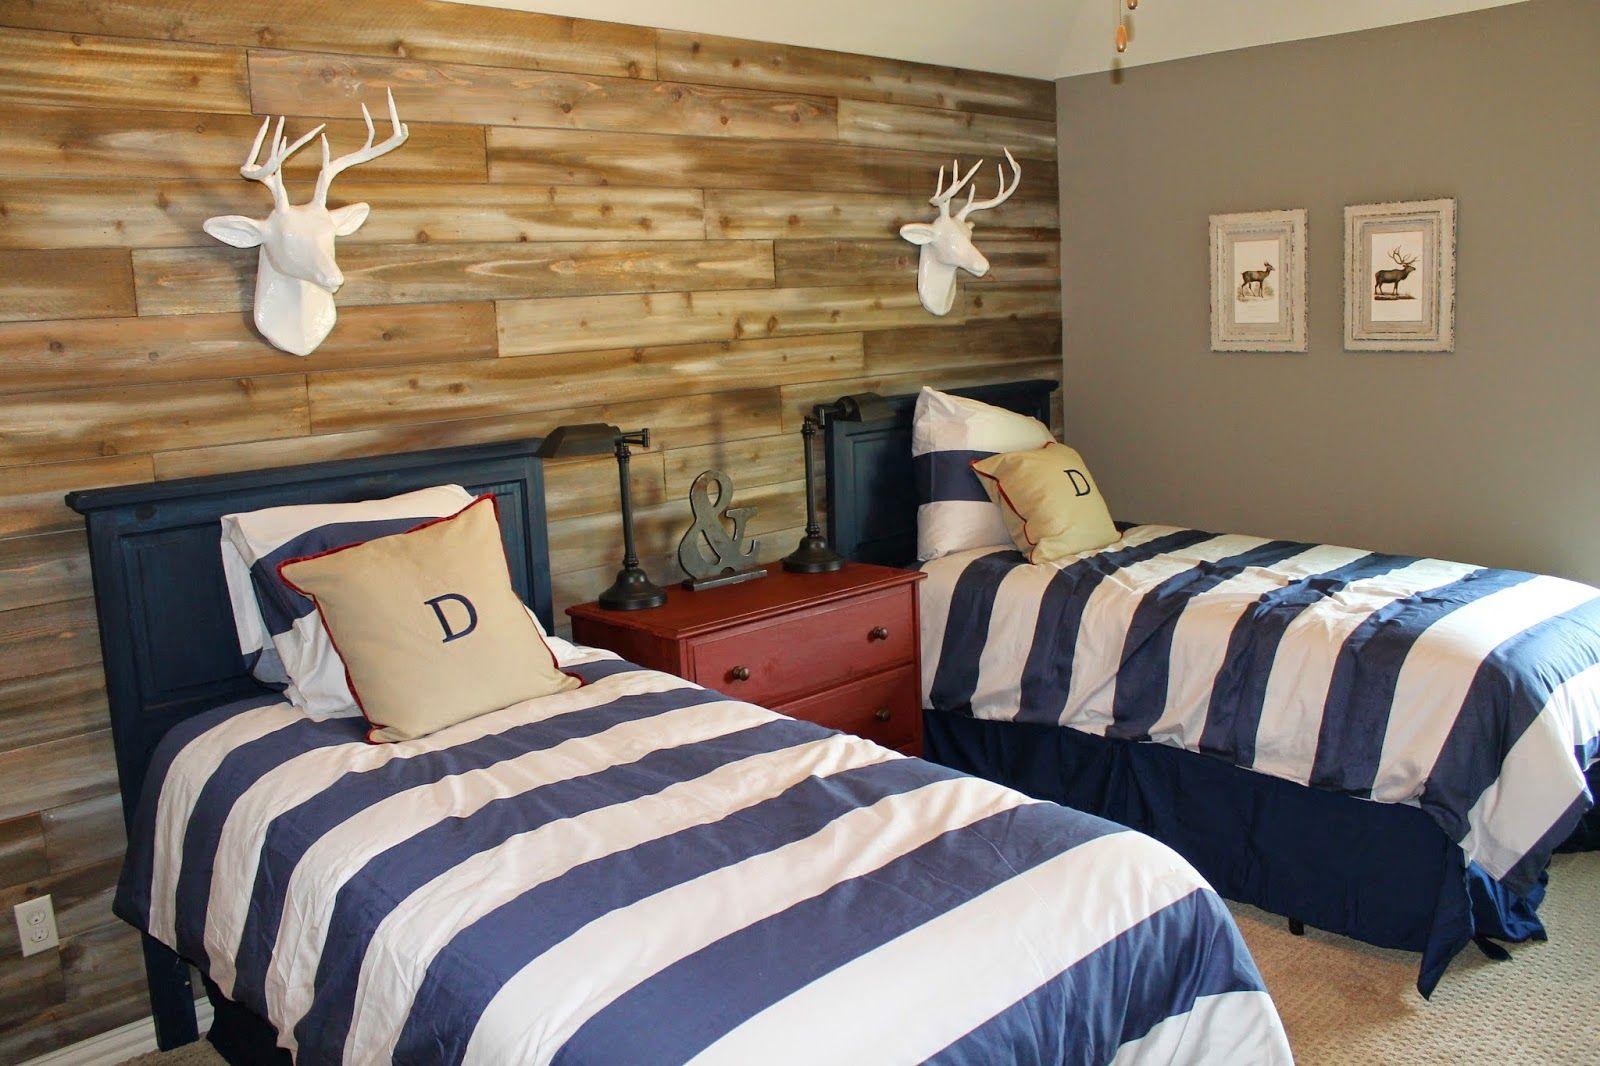 20 Modern Boys Bedroom Ideas Represents Toddler S Personality Bedroom Design Twin Boys Bedroom Boys Bedrooms